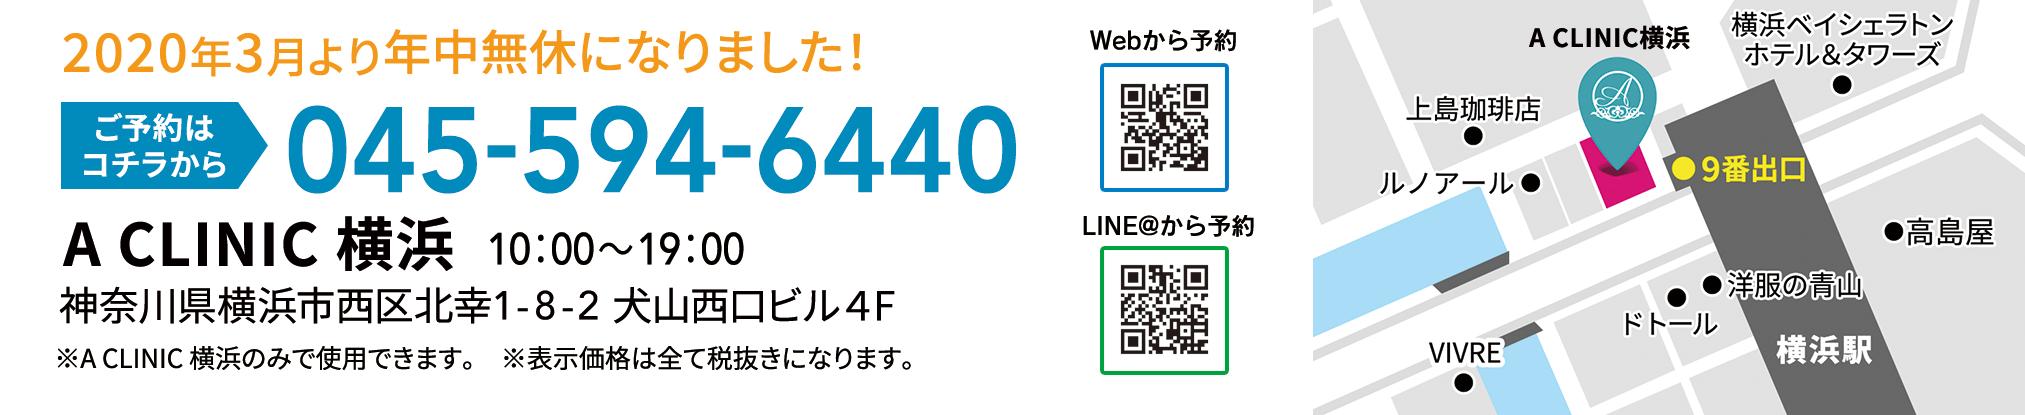 045-594-6440